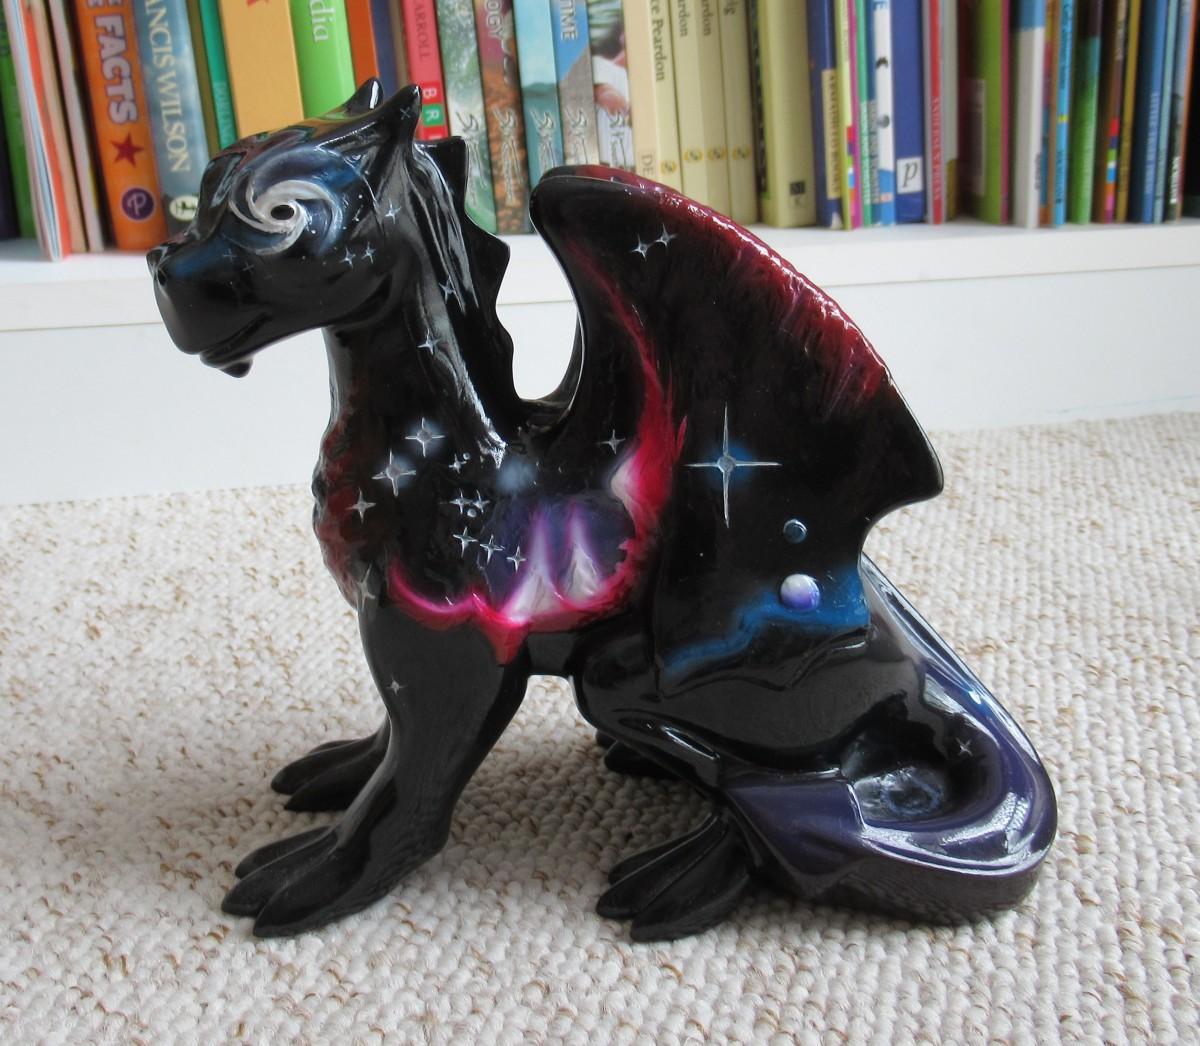 Miniature Draco Guarding the House